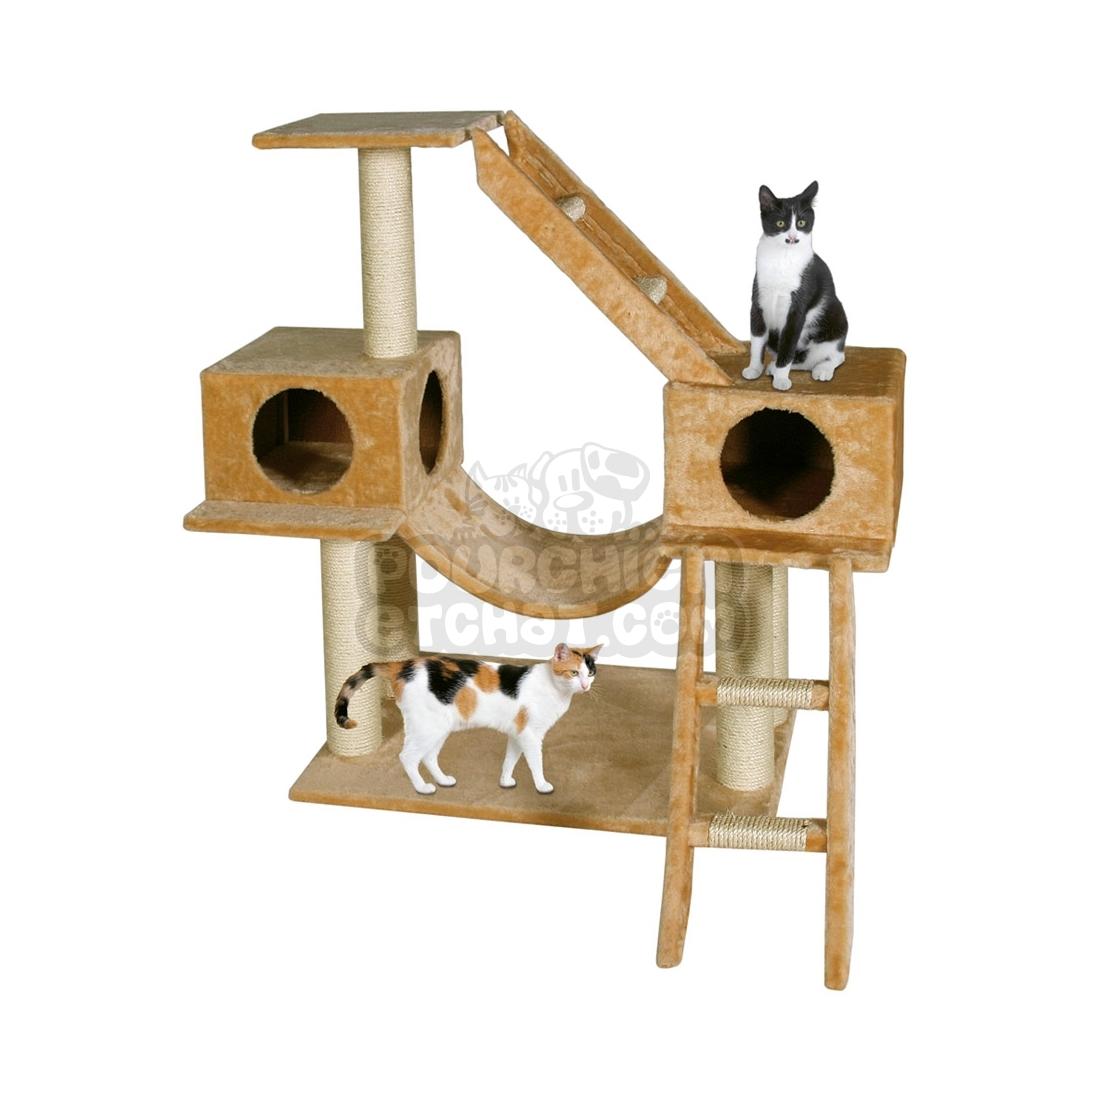 arbre chat medici. Black Bedroom Furniture Sets. Home Design Ideas